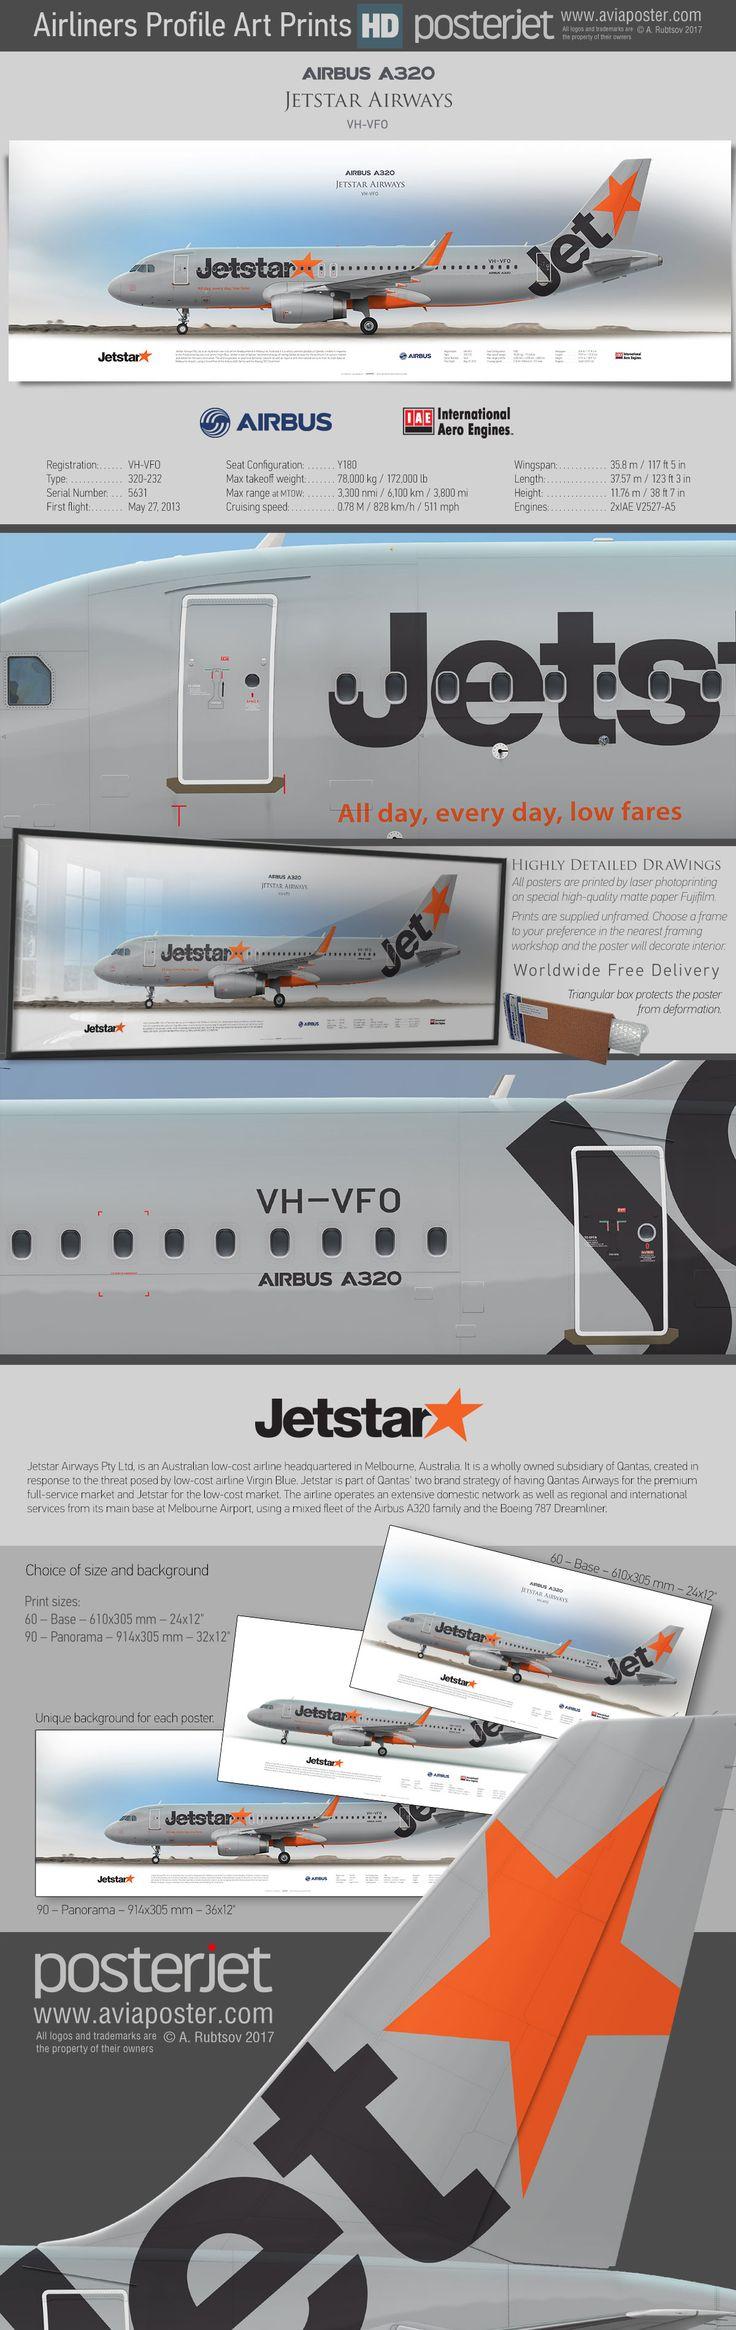 Airbus A320 Jetstar Airways VH-VFO   www.aviaposter.com   #aviation #jetliner #airplane #pilot #aviationlovers #avgeek #jet #airport #pilotlife #cabincrew